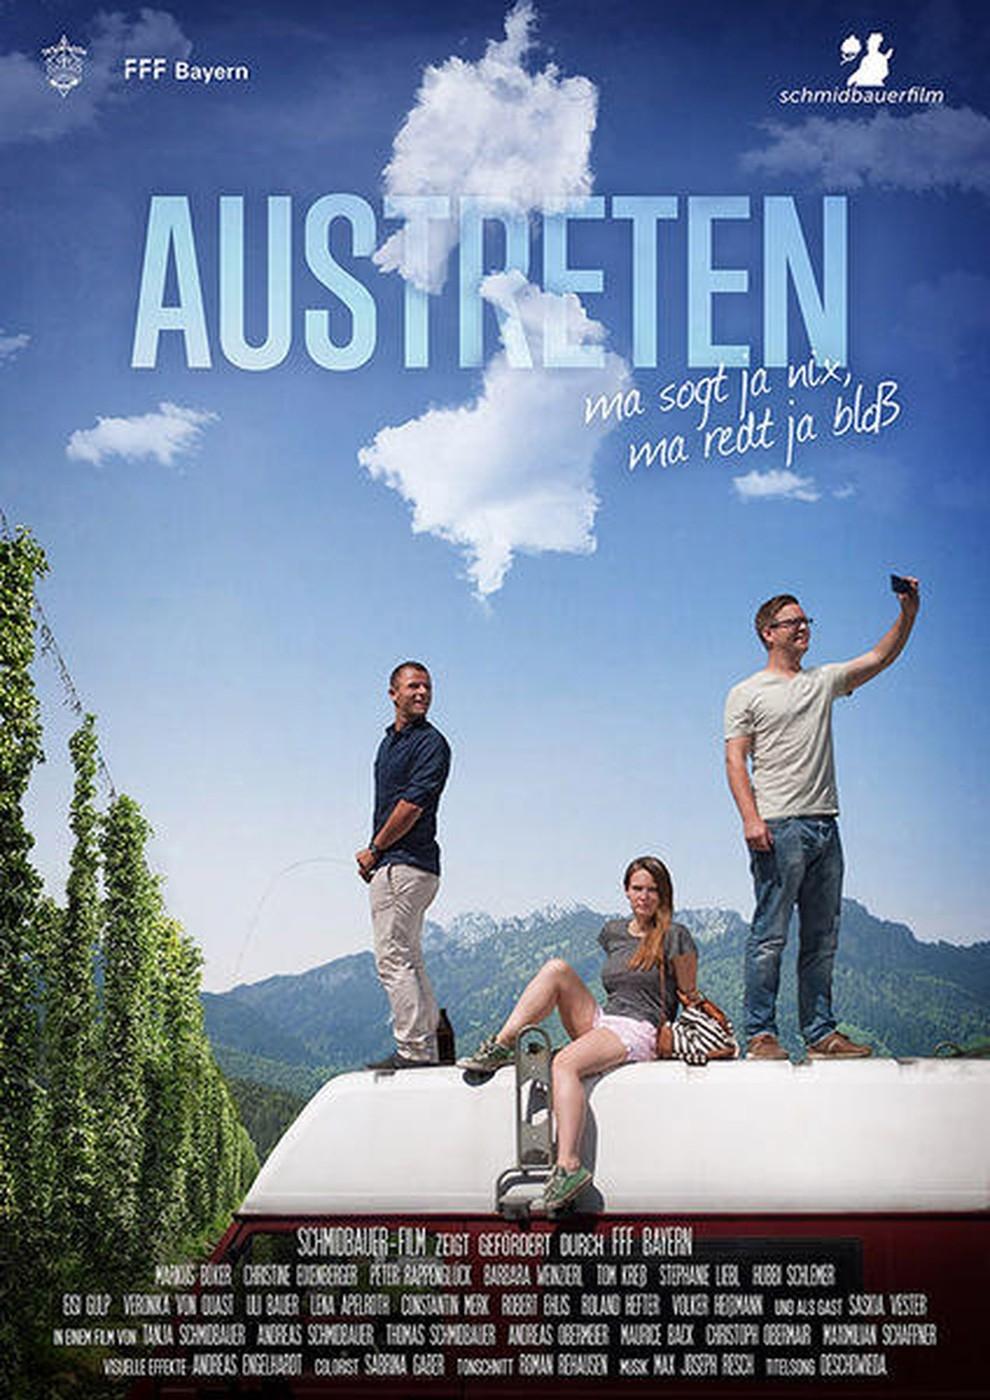 Austreten (Poster)